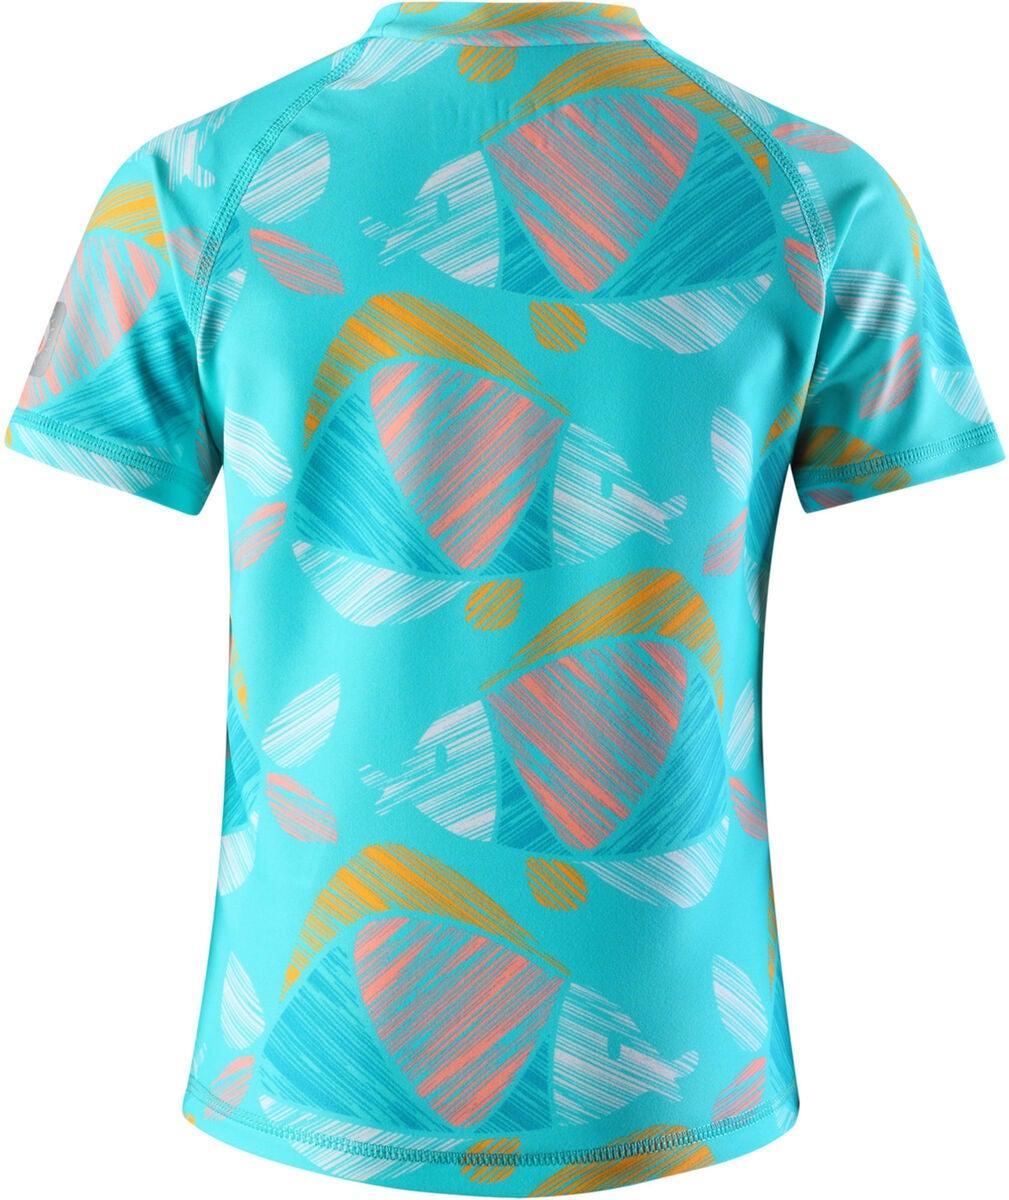 8a81c7e69e6 Køb Reima Azores UV-Trøje, Bright Turquoise   Jollyroom